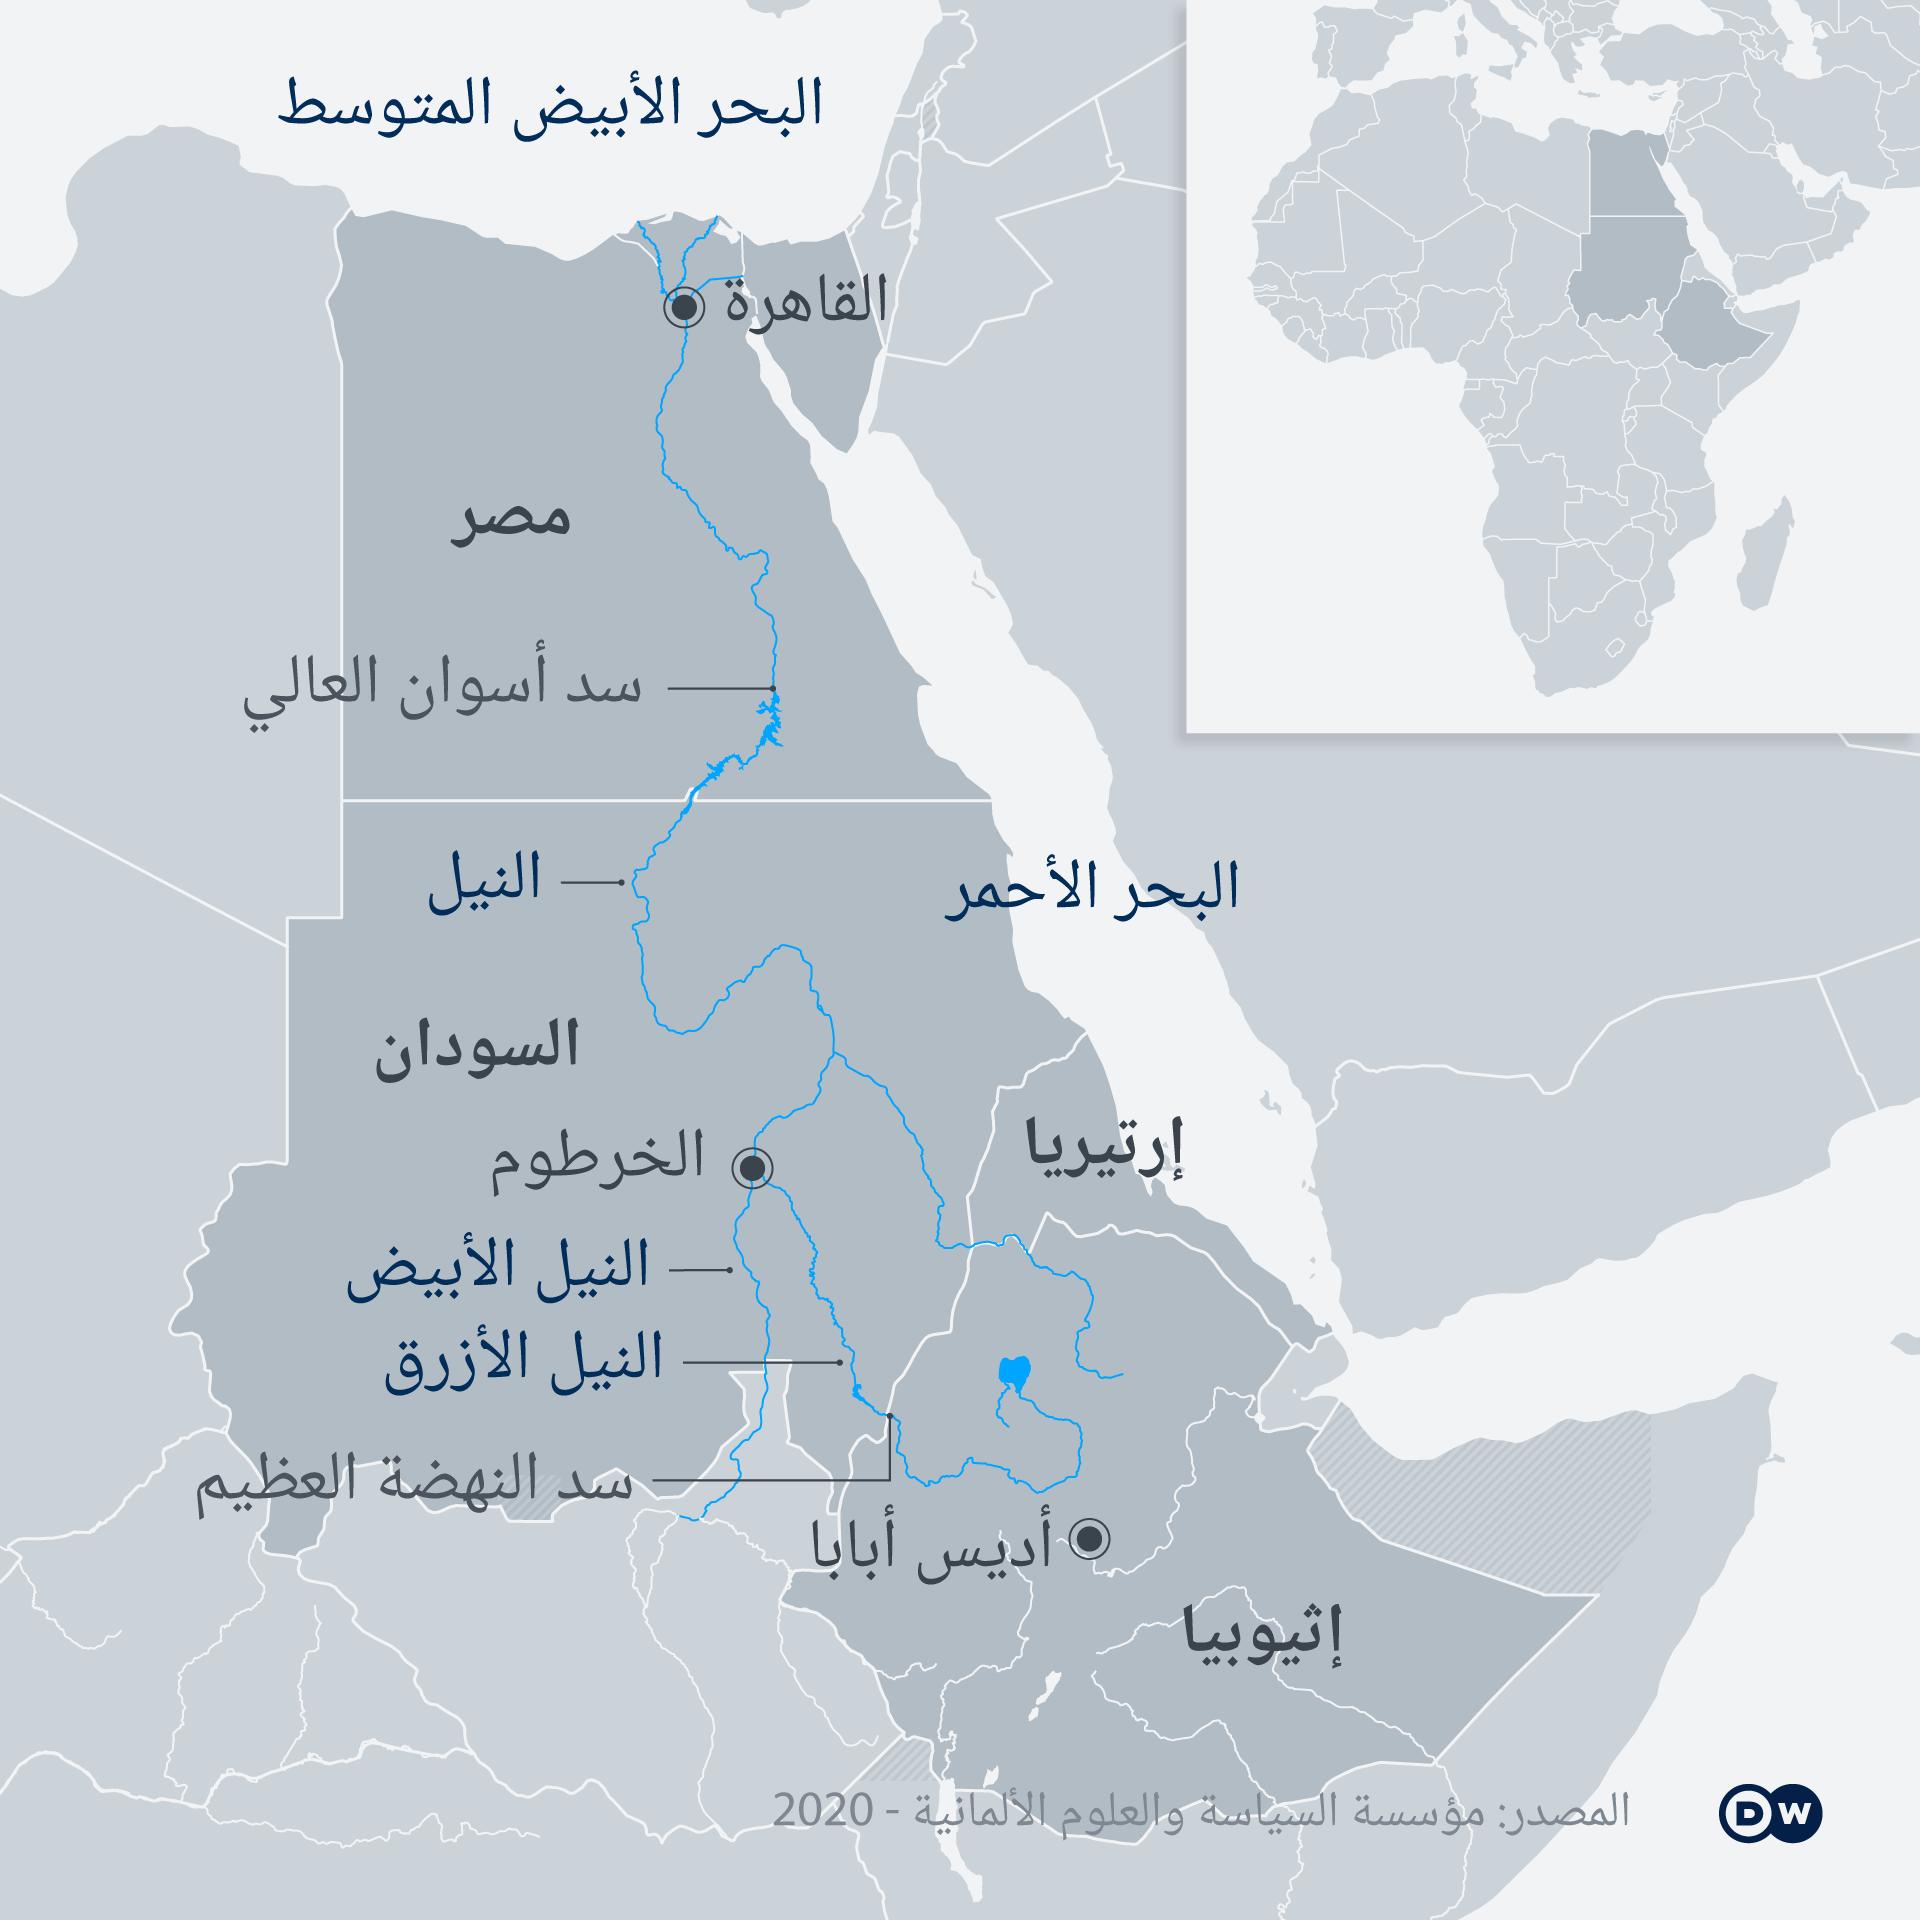 Karte Infografik wasserkrieg Ägypten Äthiopien AR